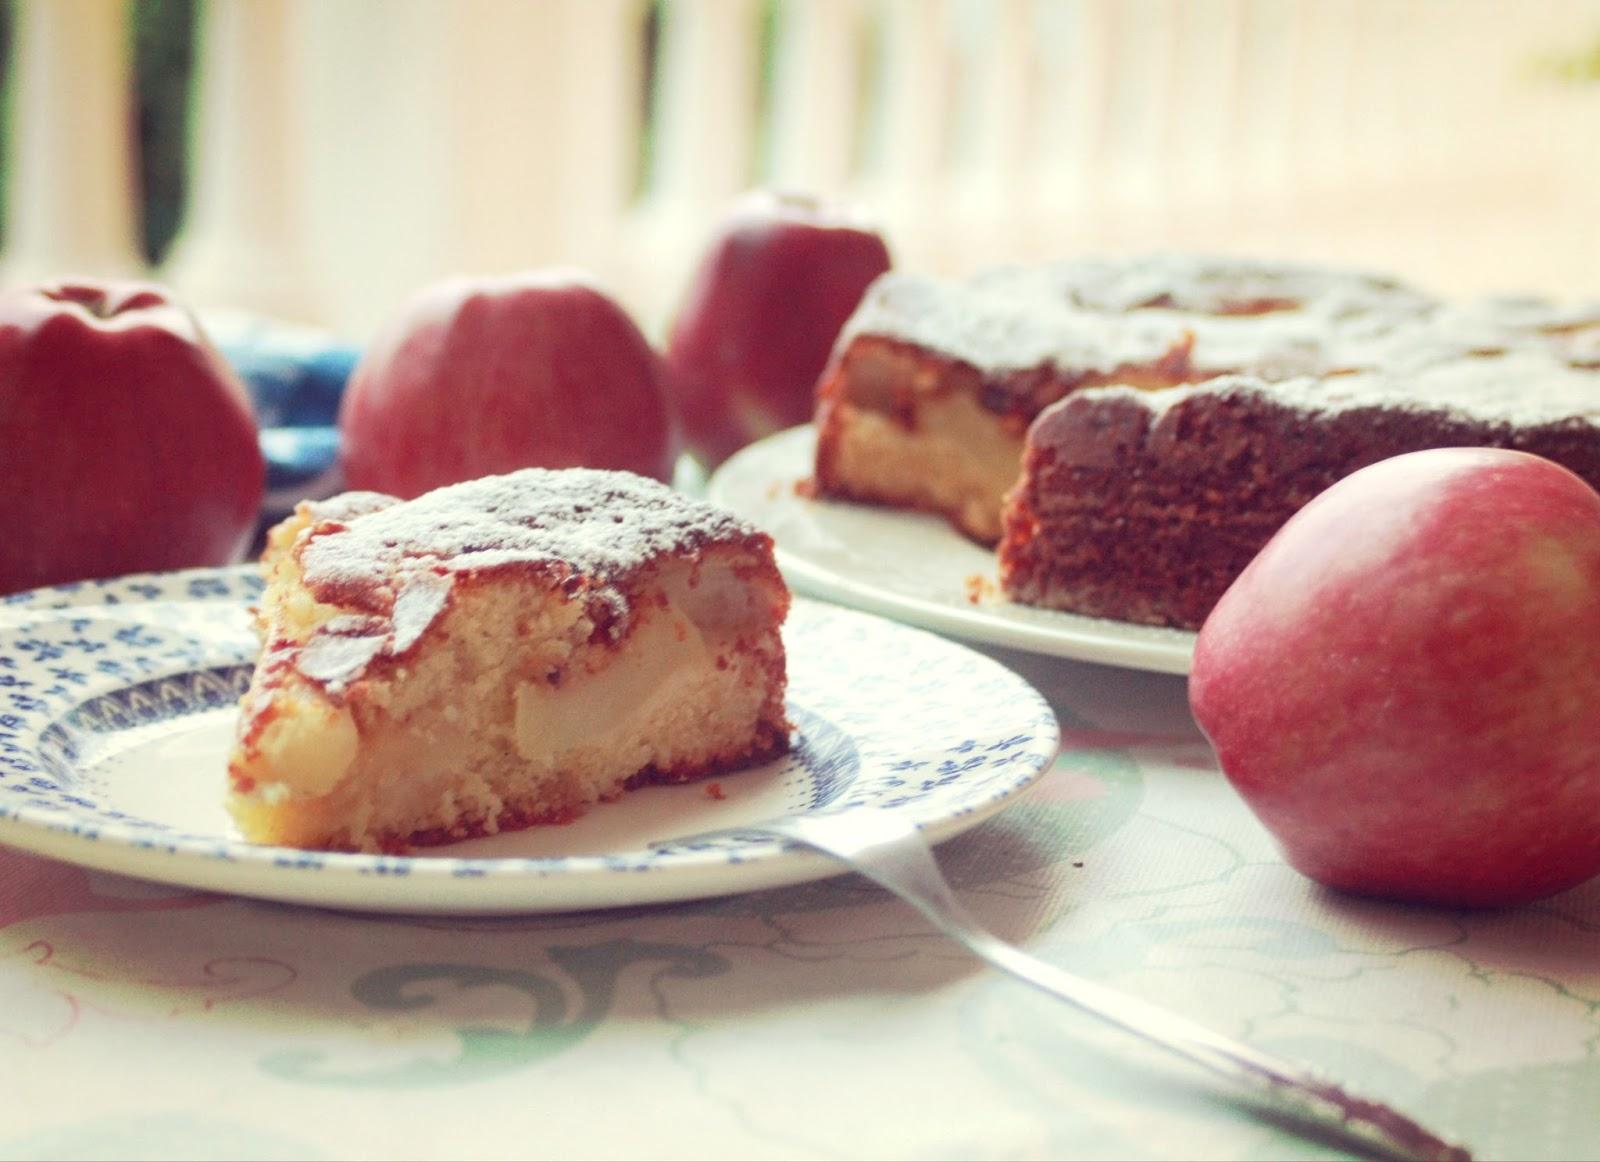 Trozo de bizcocho de manzana, receta en Lelleco blog